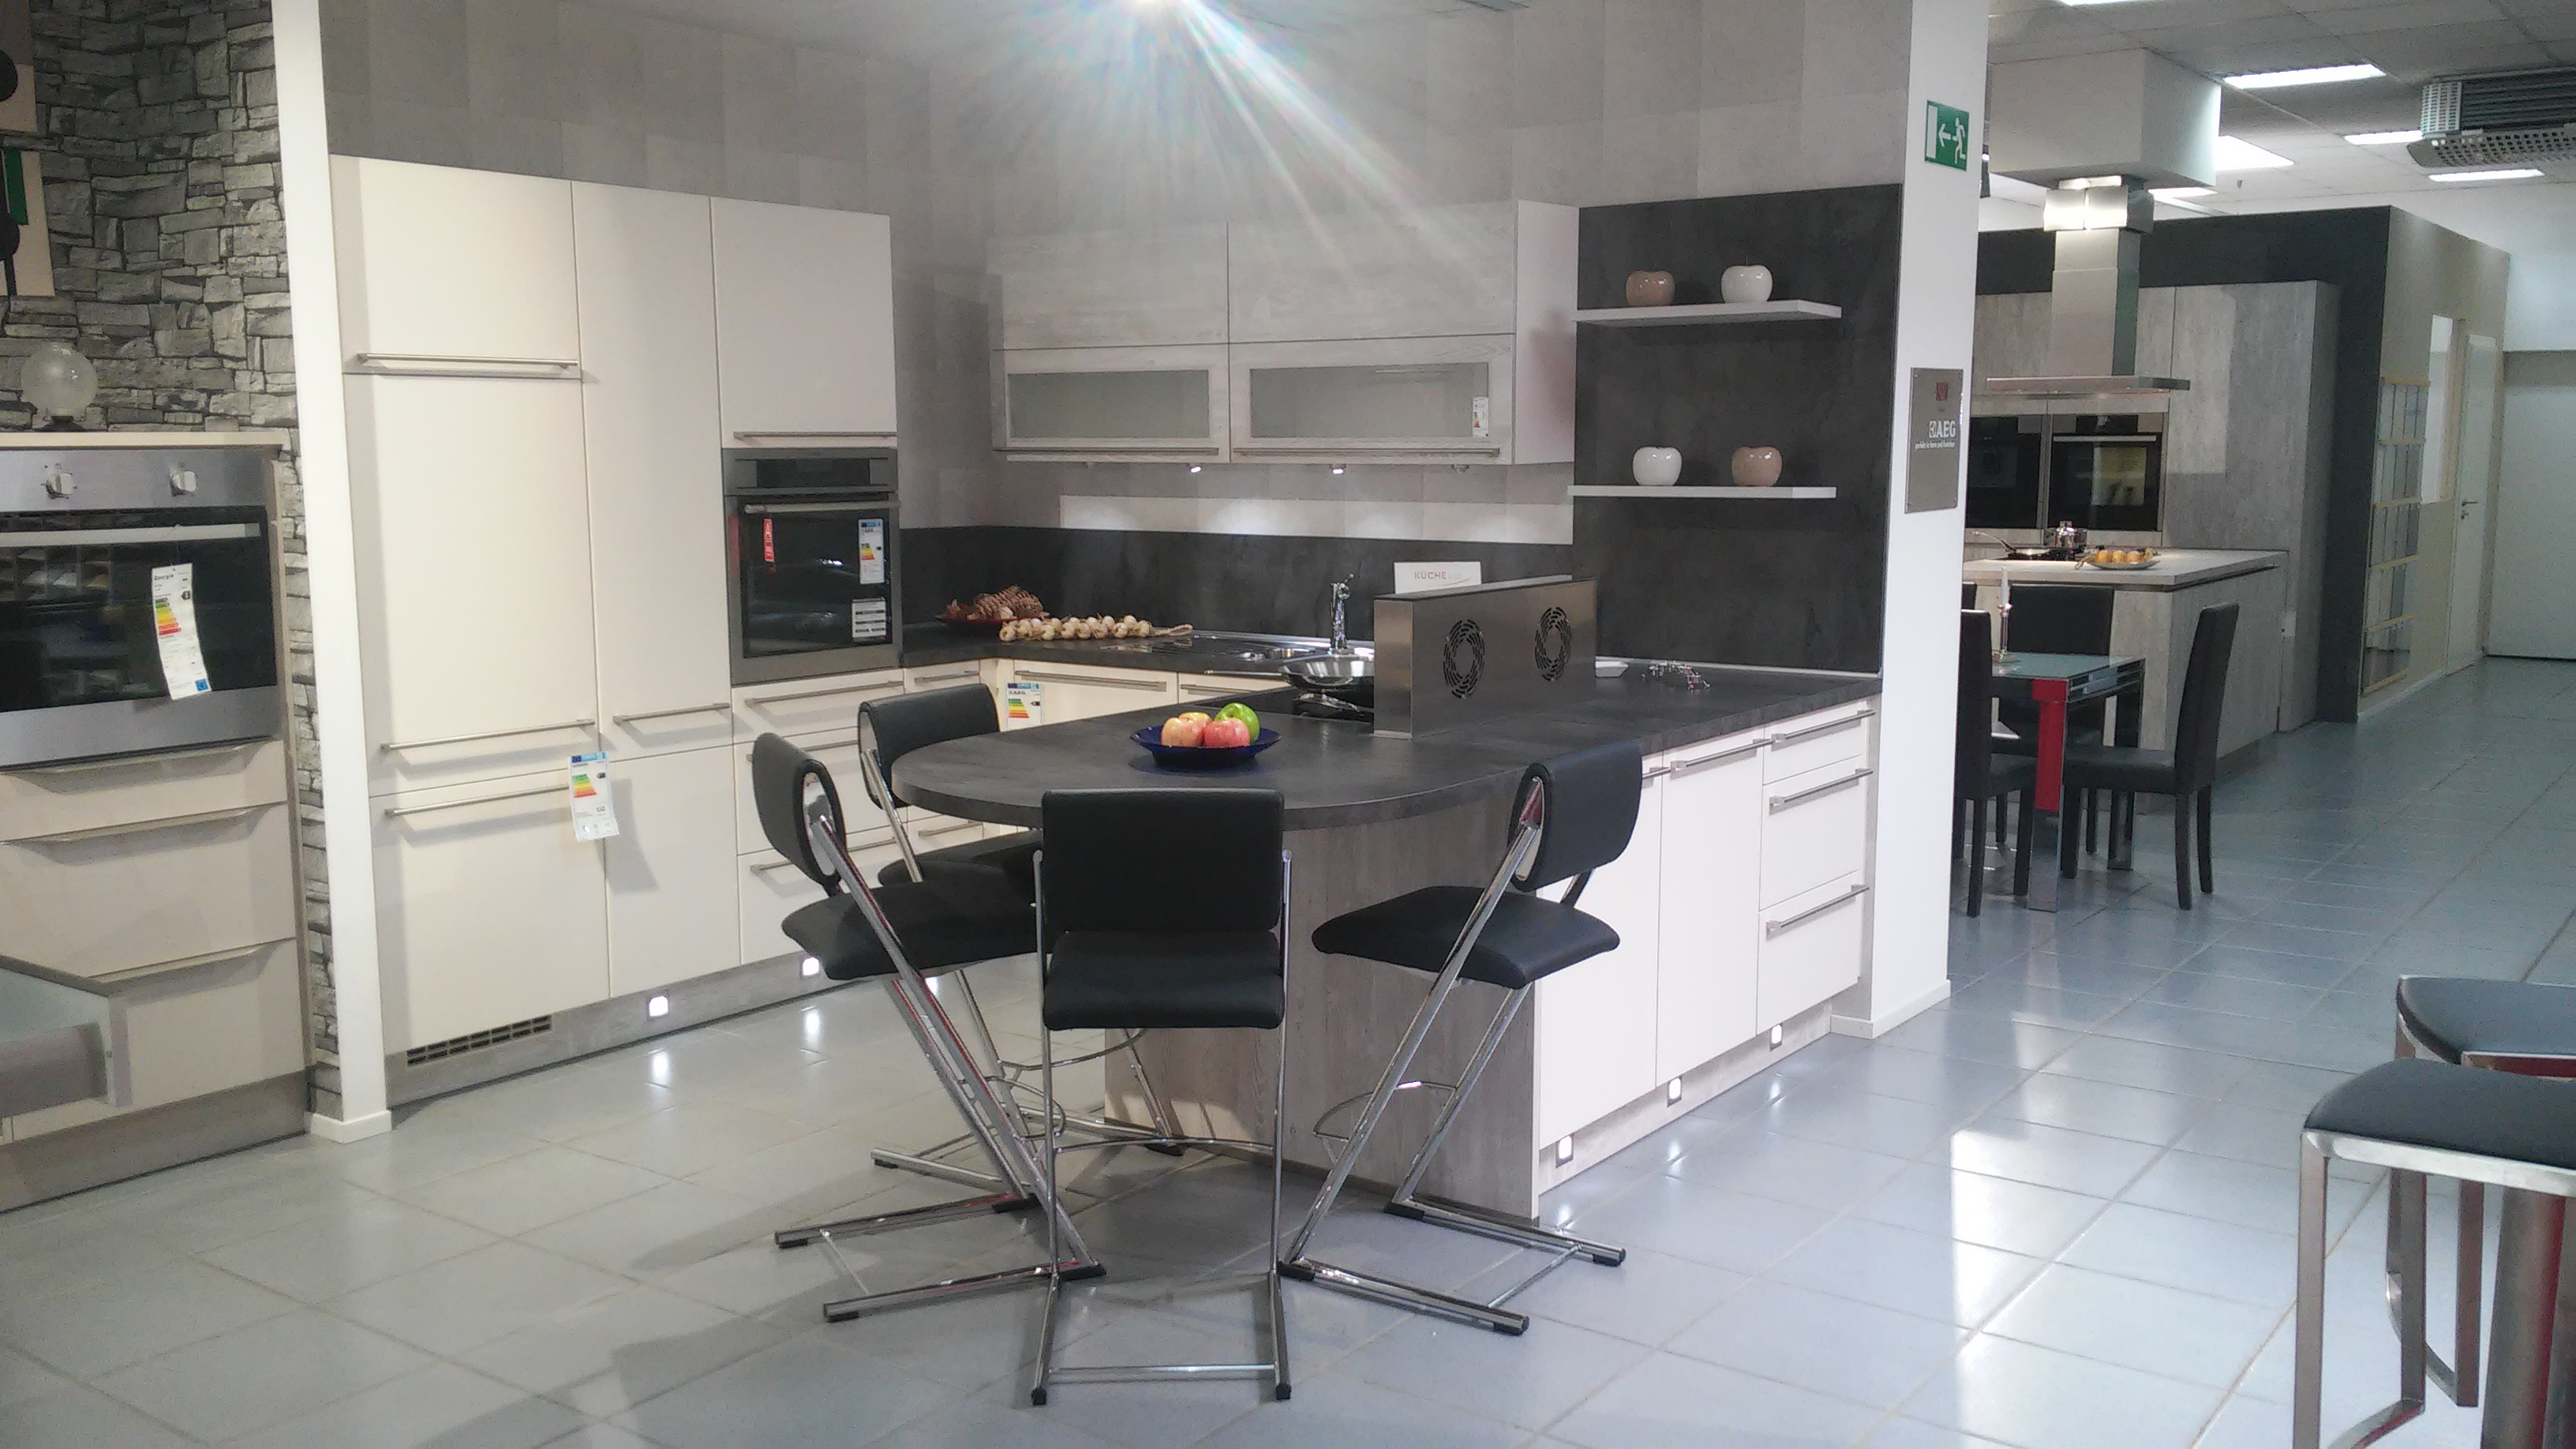 k chen in kaiserslautern. Black Bedroom Furniture Sets. Home Design Ideas